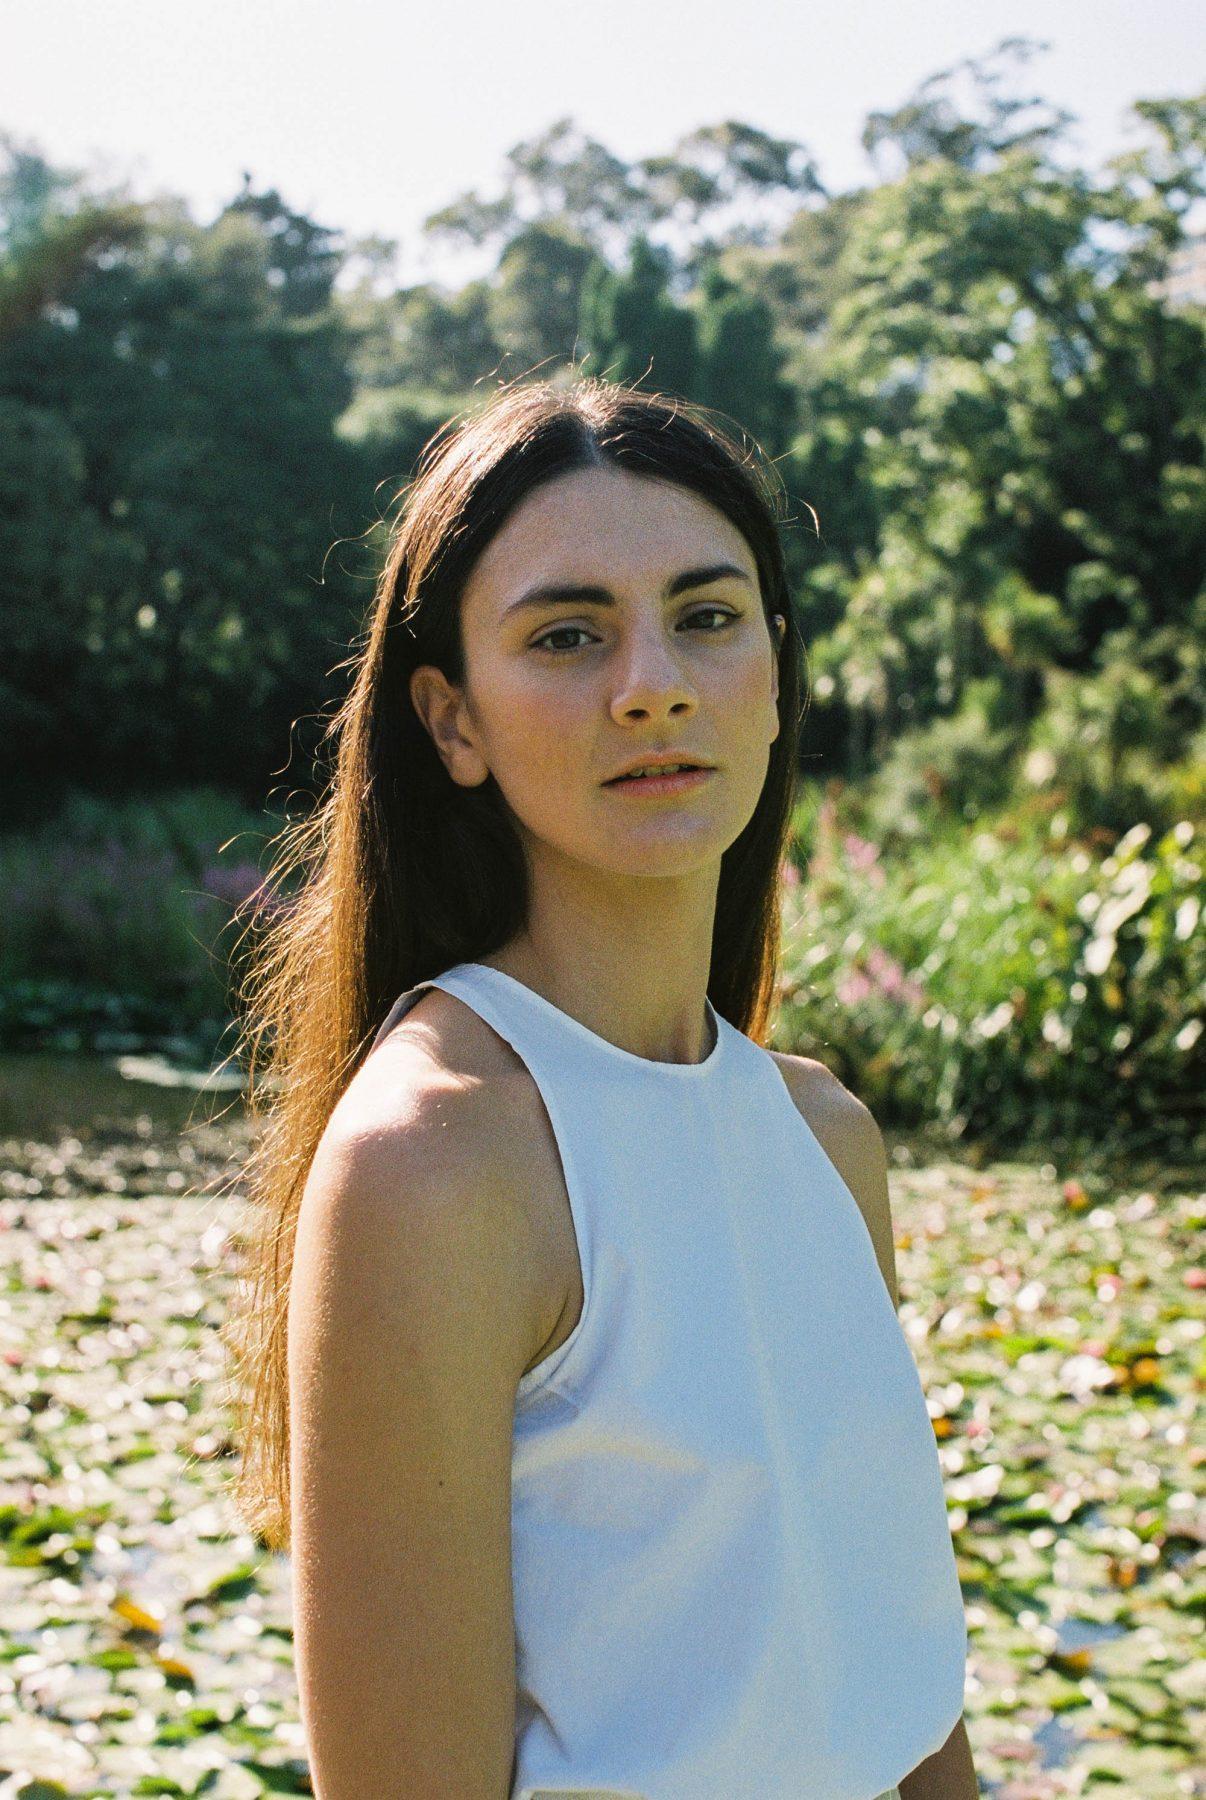 Simone Holtznagel Nude Photos 47